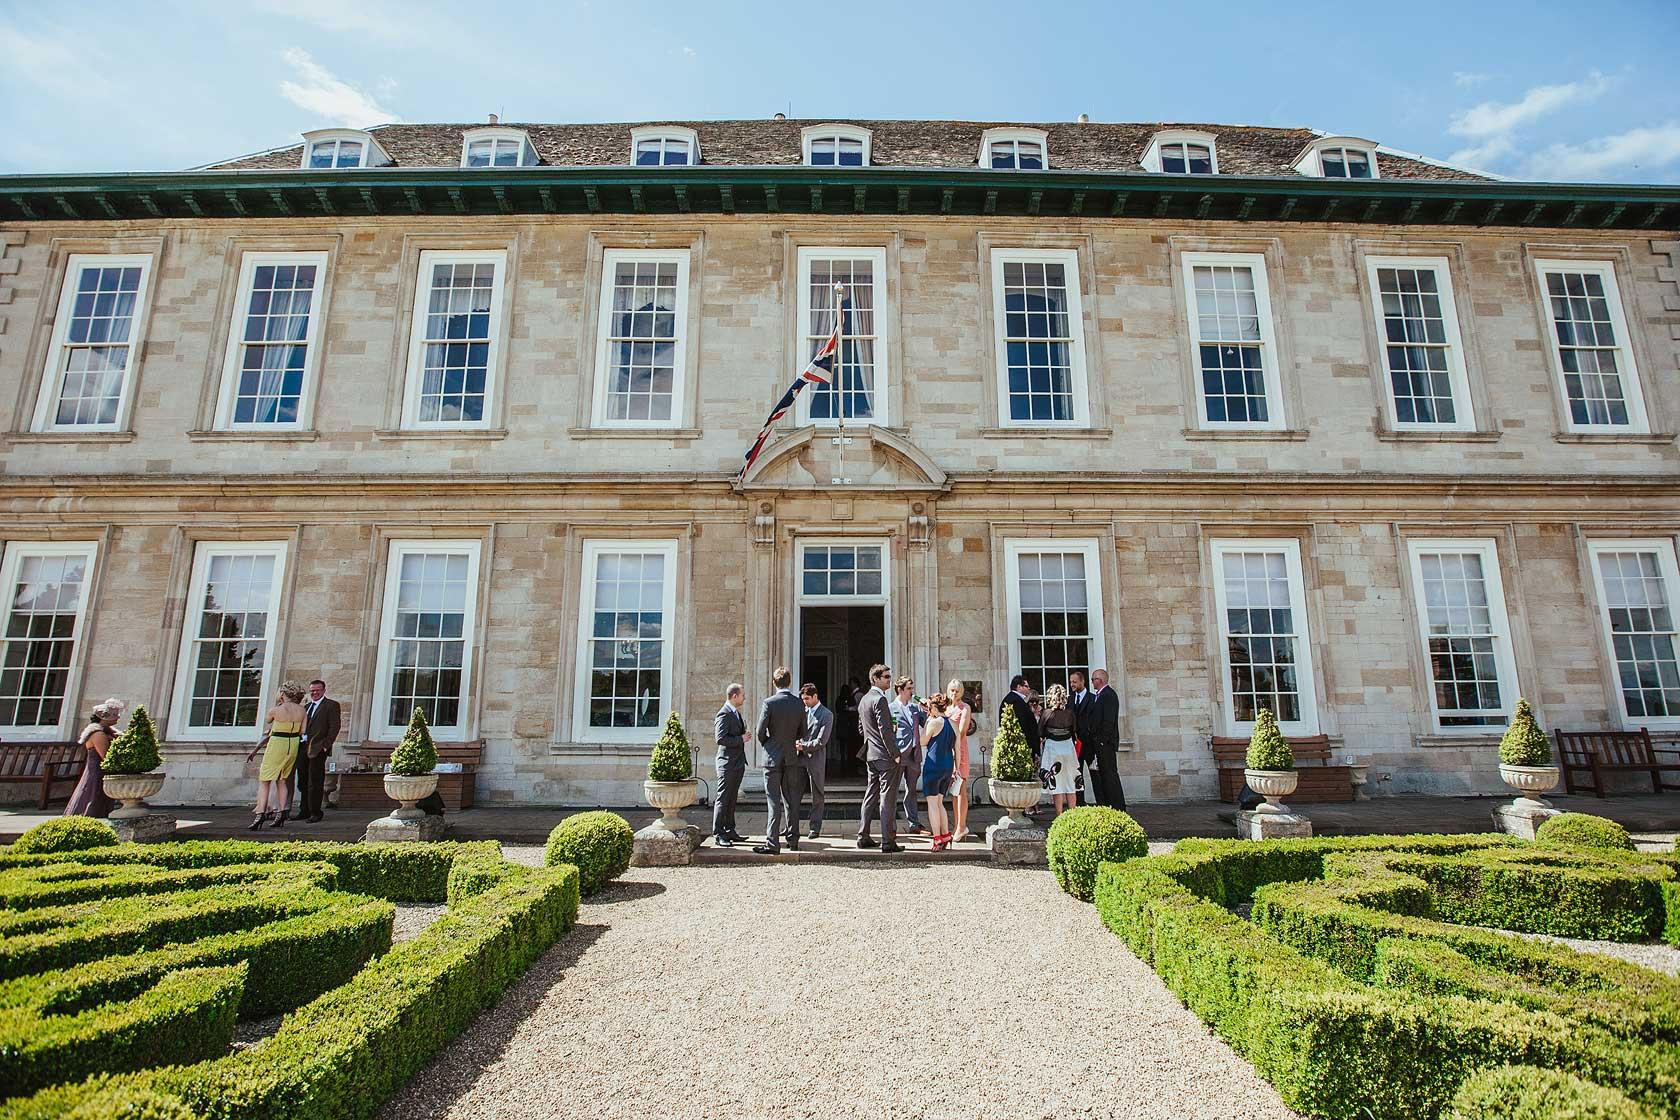 Reportage Wedding Photography in Melton Mowbray